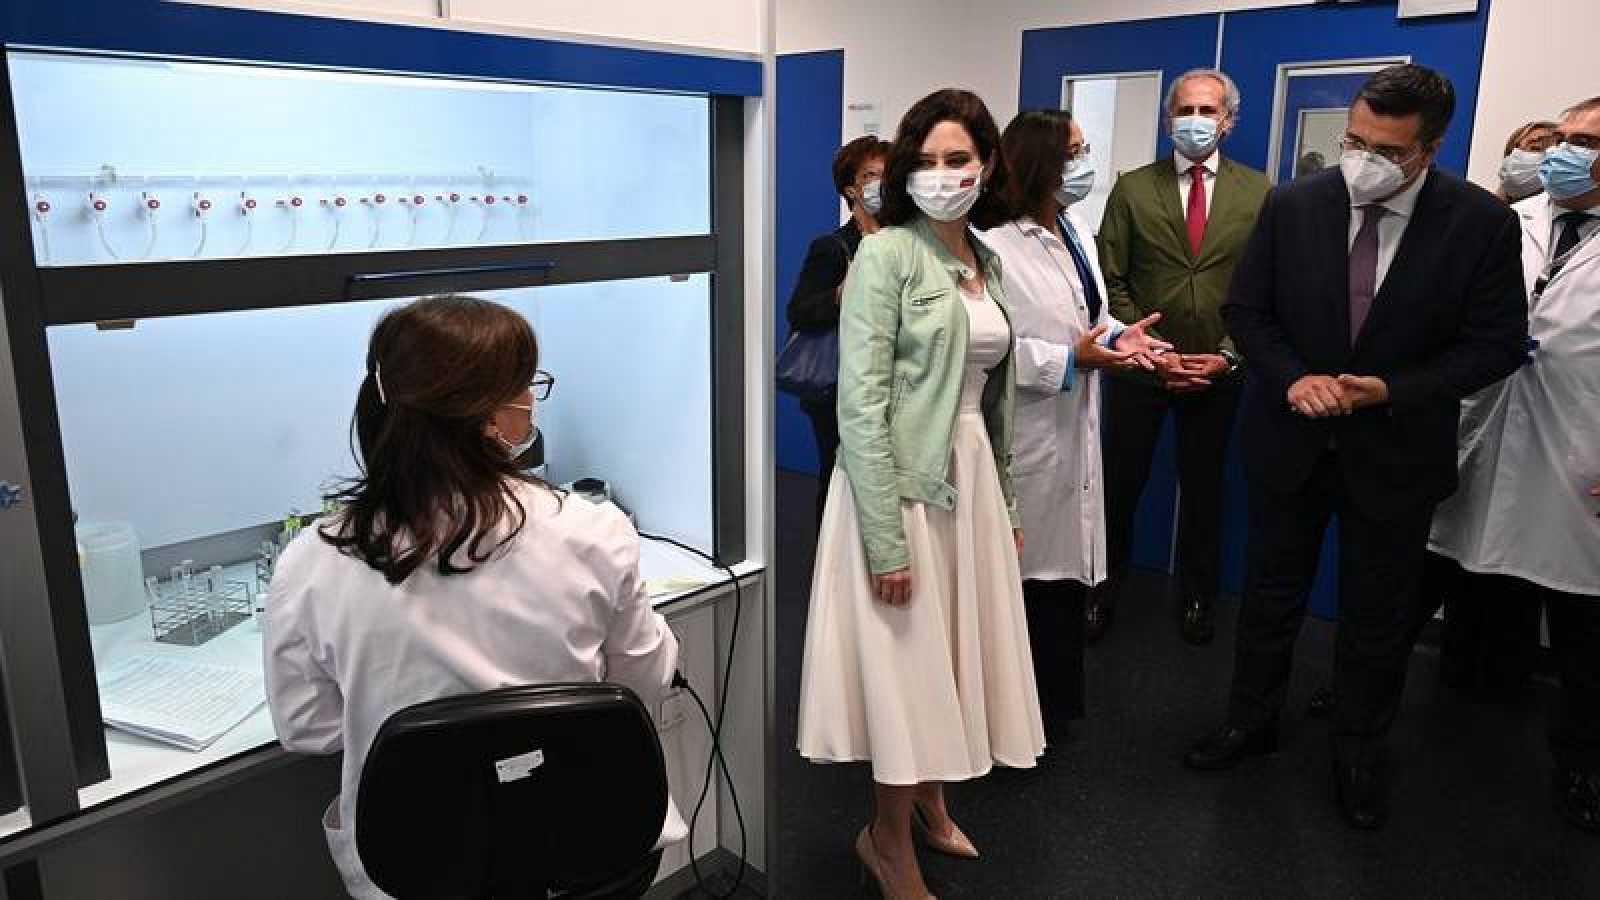 La presidenta madrileña visita el Hospital Isabel Zendal